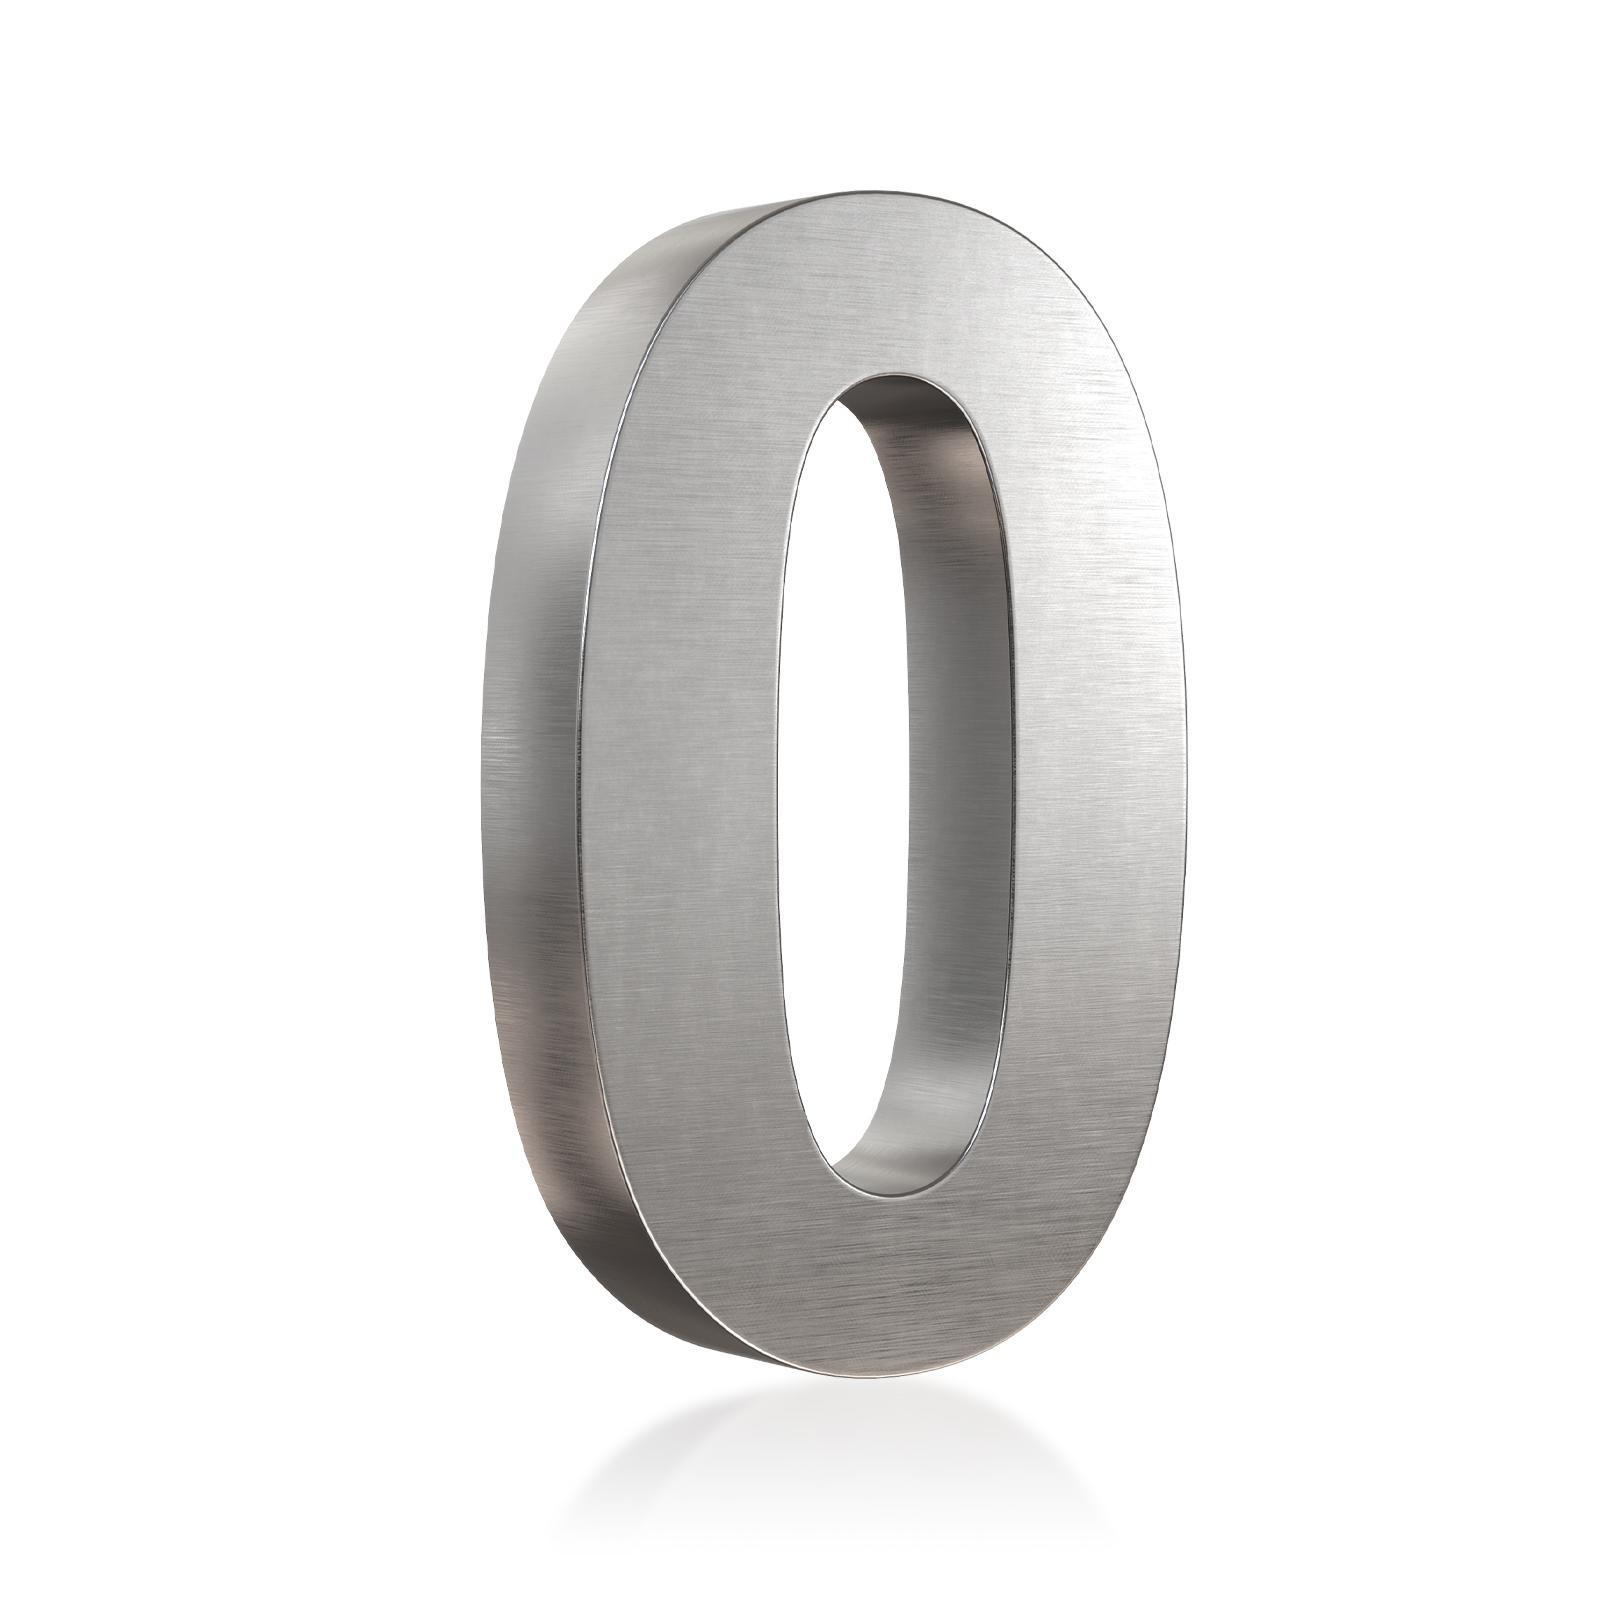 3D Hausnummer 0 Edelstahl in 3D Design Arial V2A